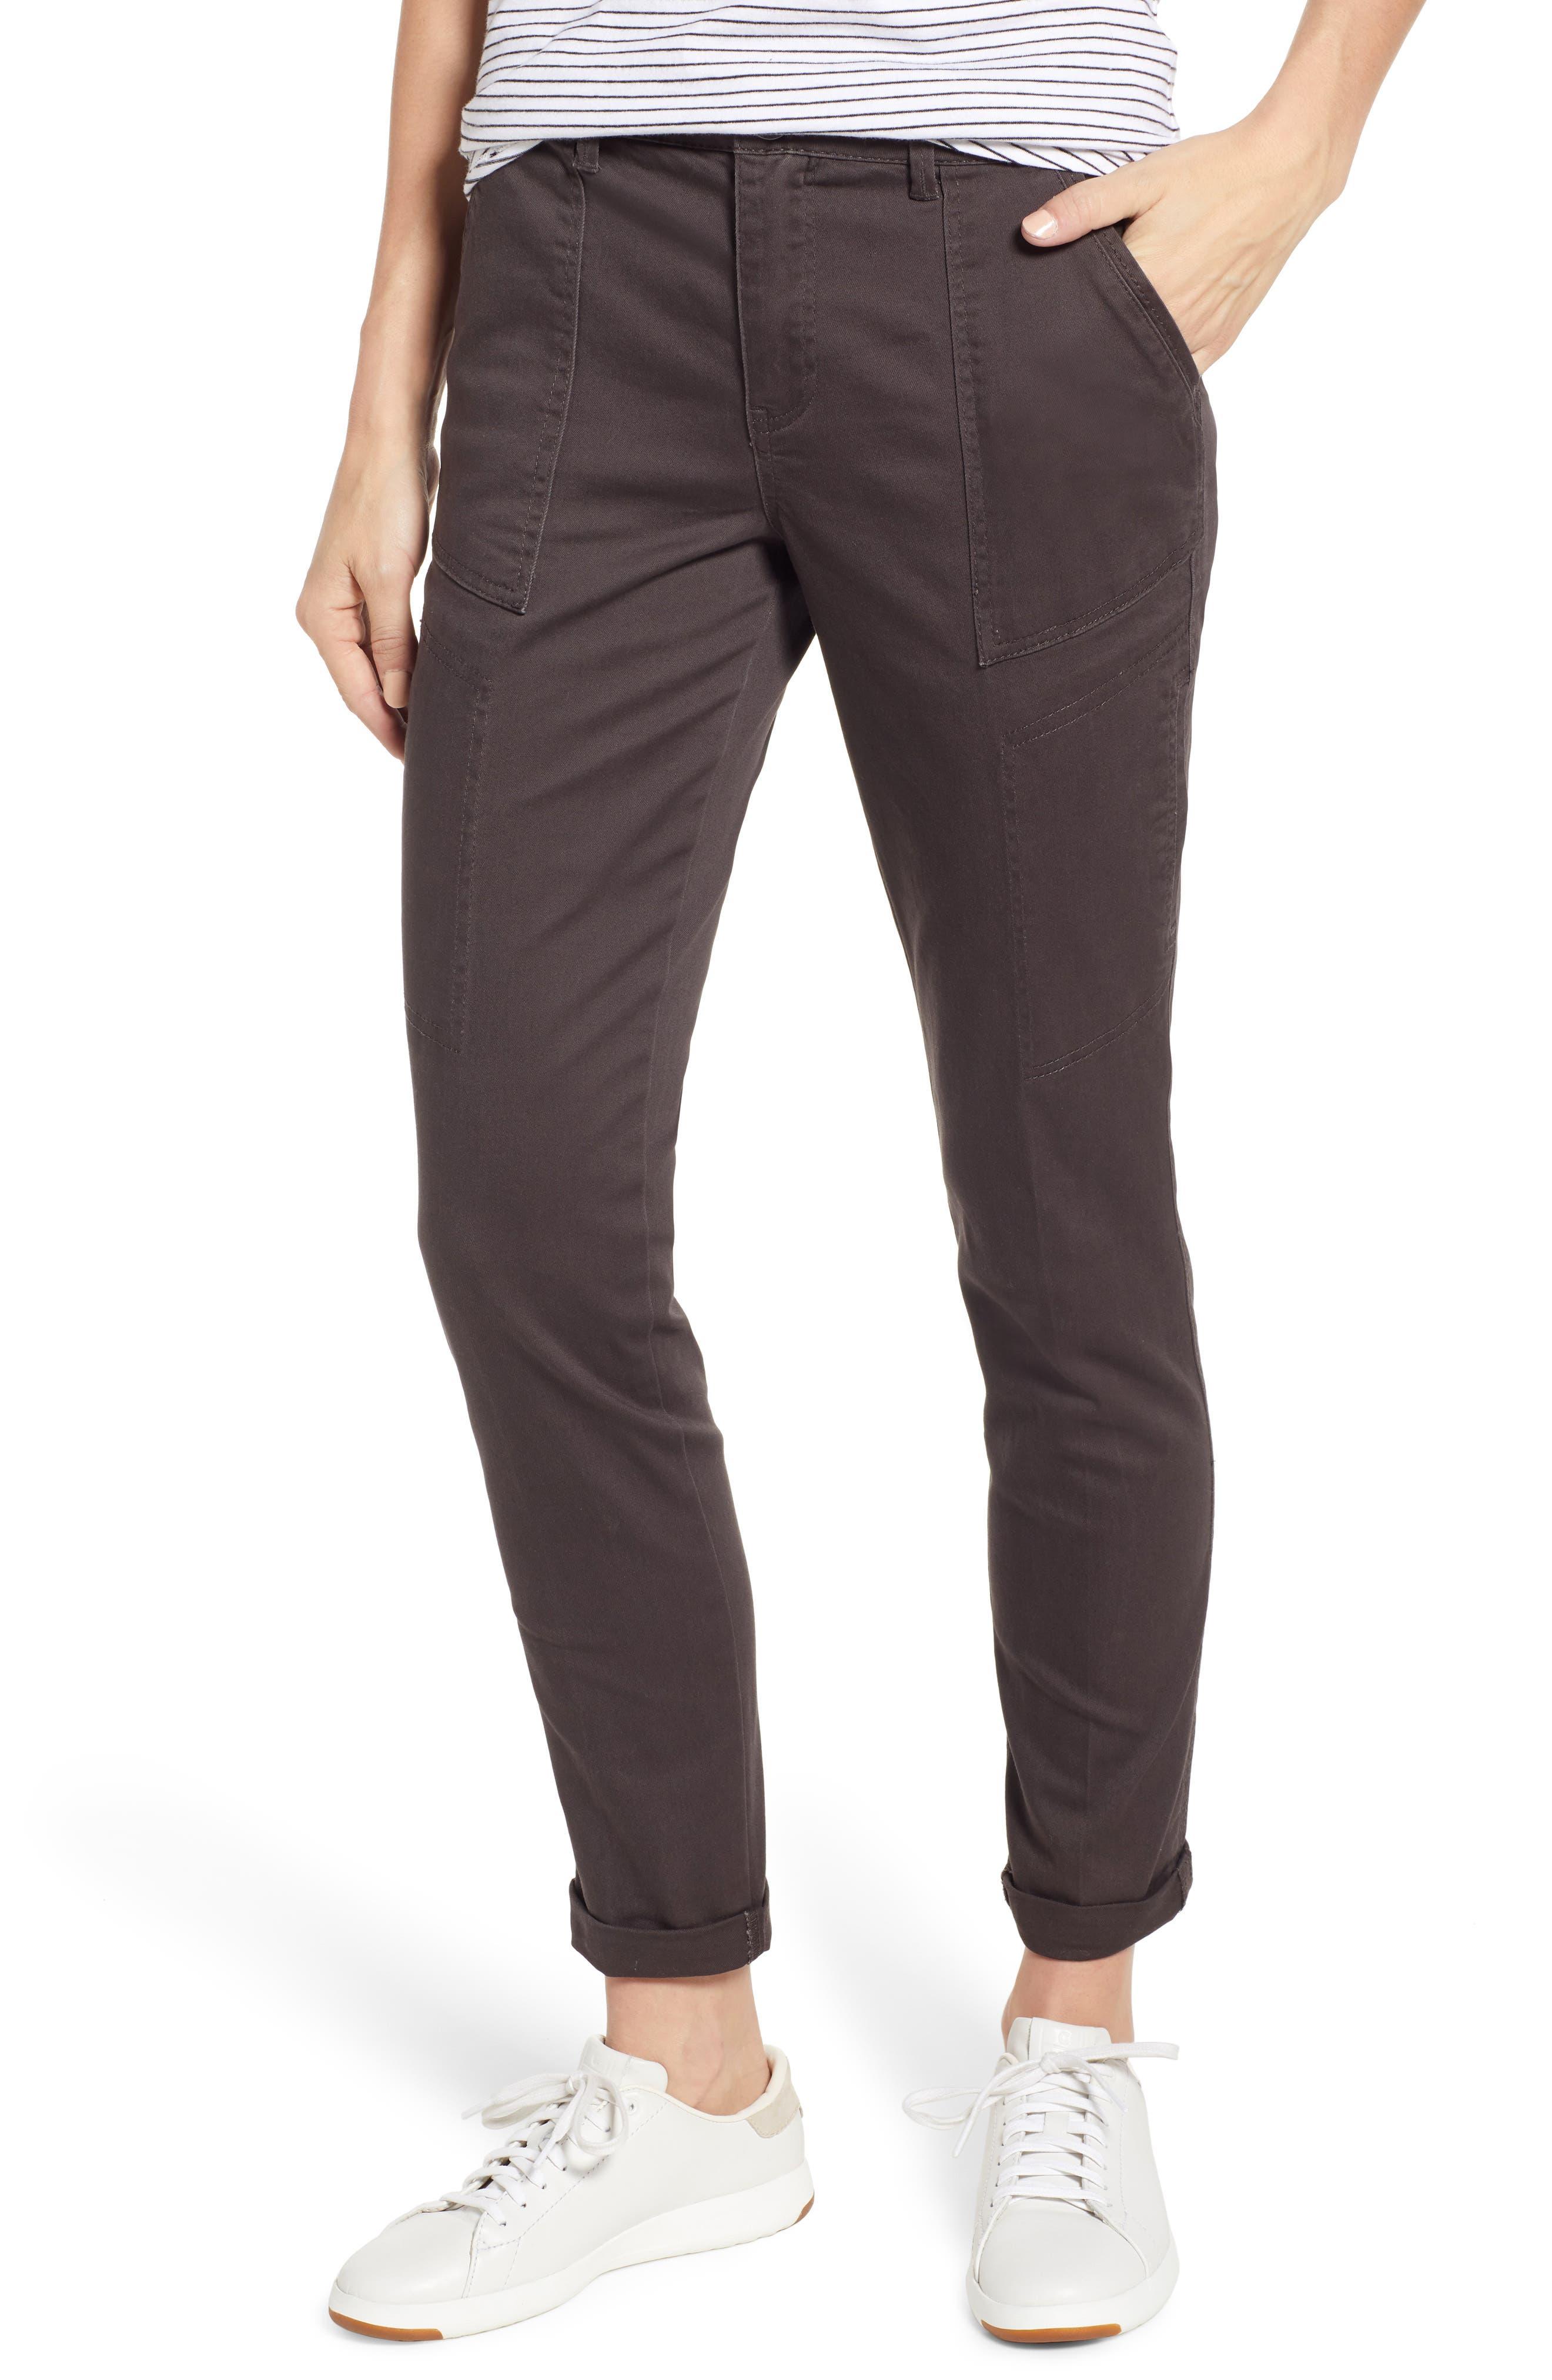 Wit & Wisdom Flex-Ellent High Waist Cargo Pants, Brown (Nordstrom Exclusive)